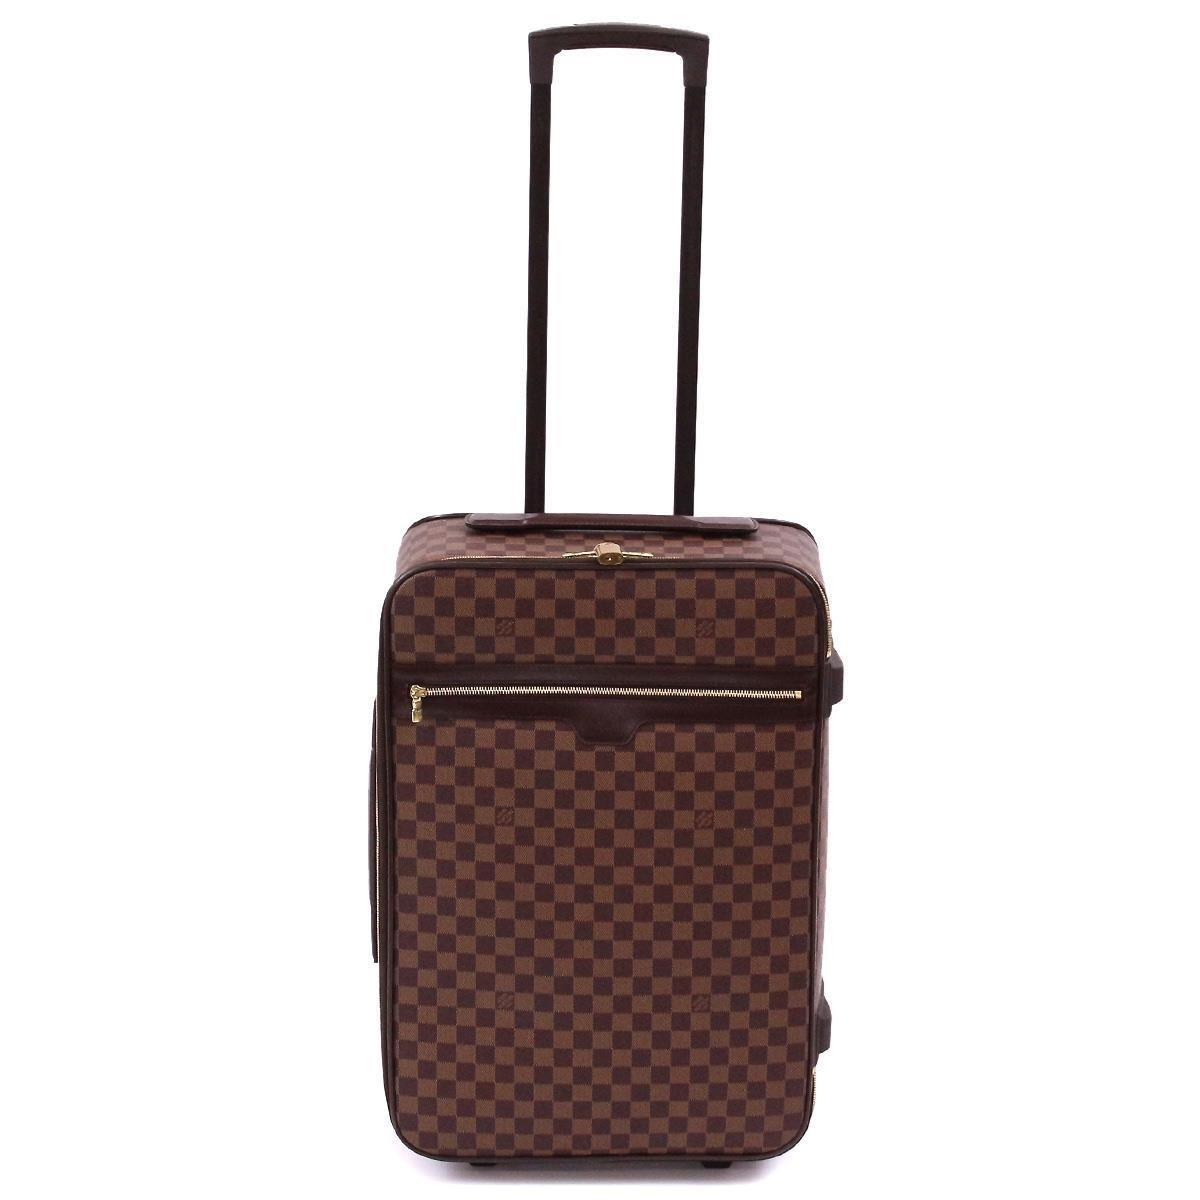 25ee971ae Lyst - Louis Vuitton Damier Pegase 55 Travel Carry Bag Ebene N23294 ...